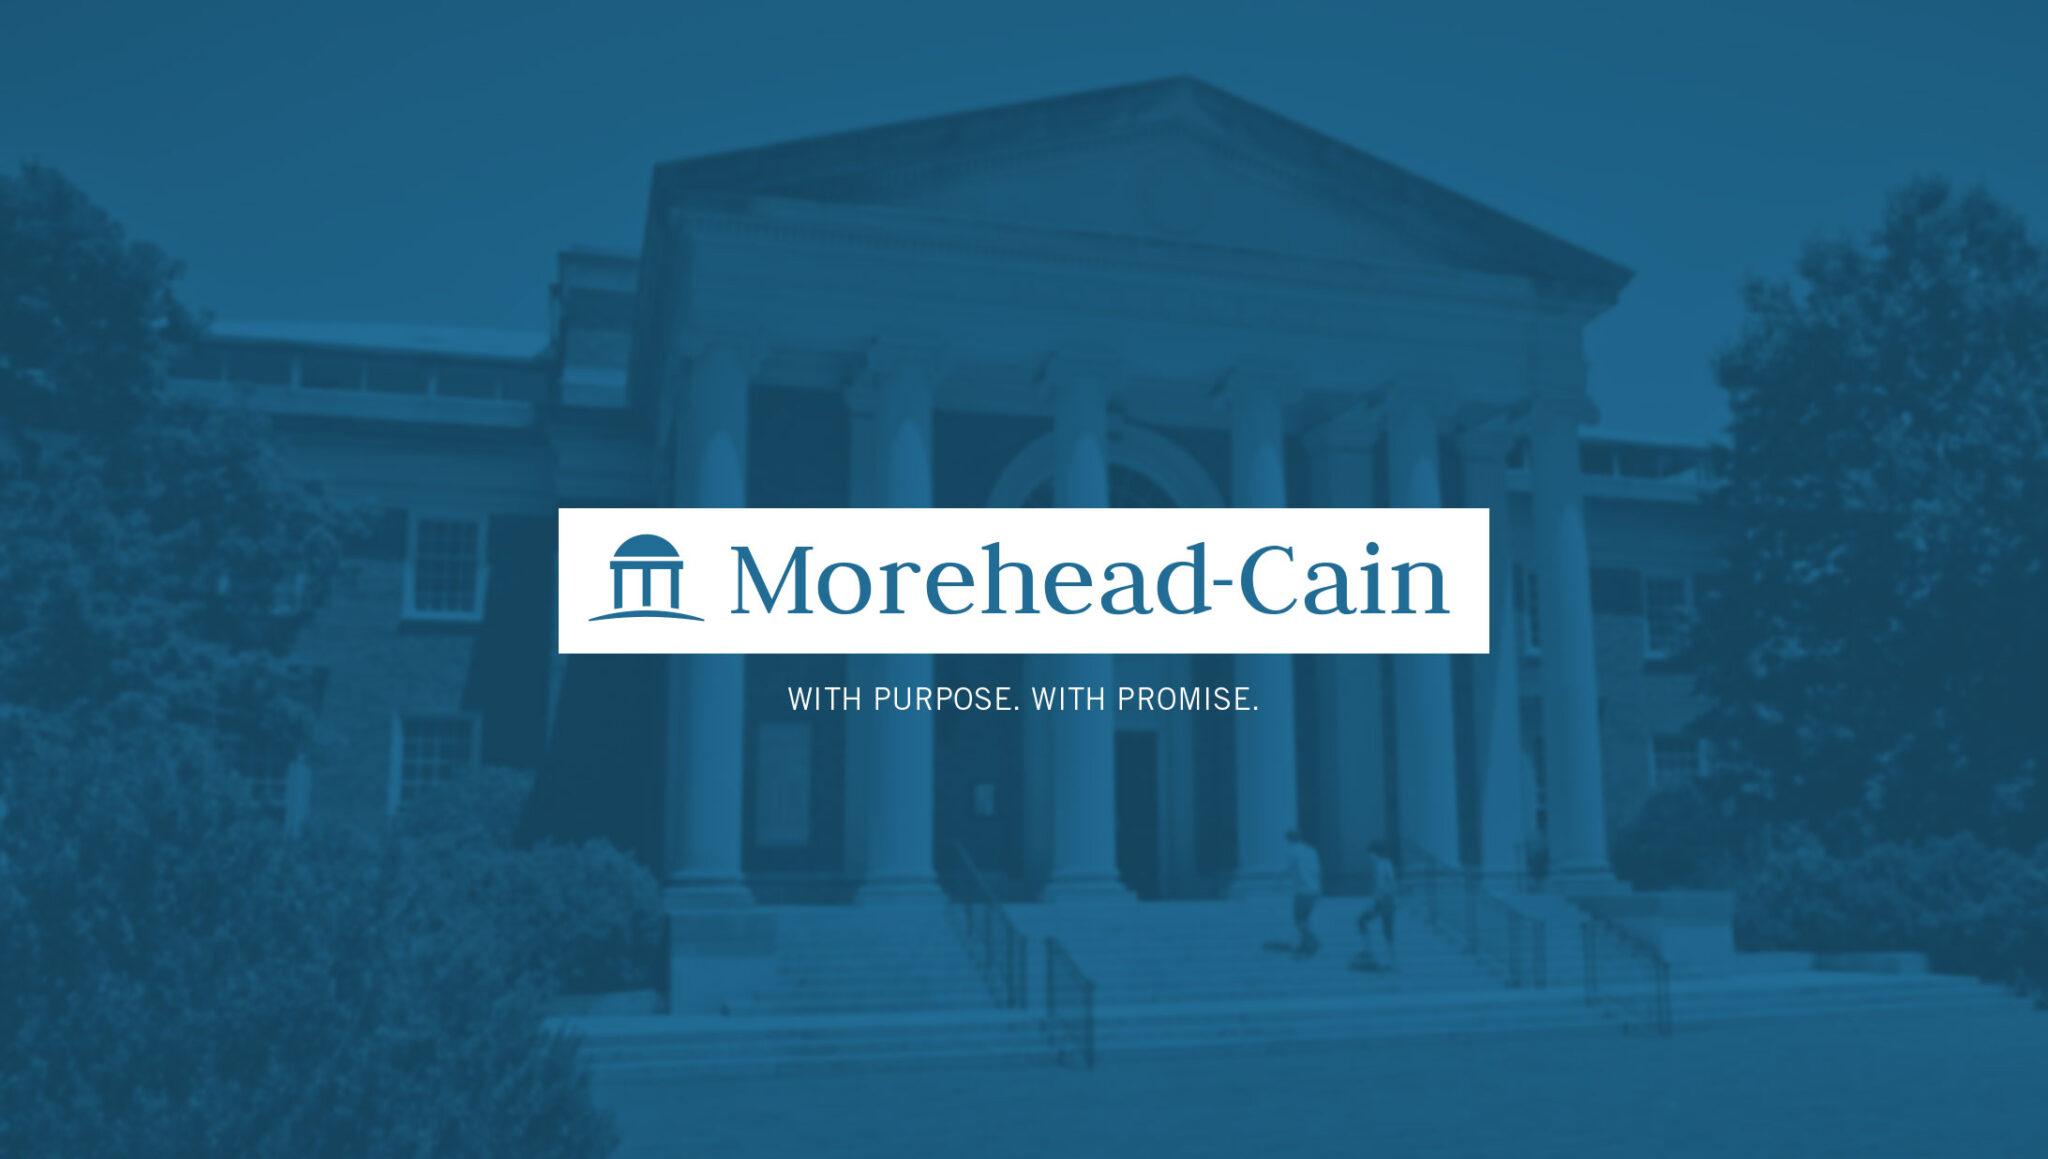 Morehead-Cain